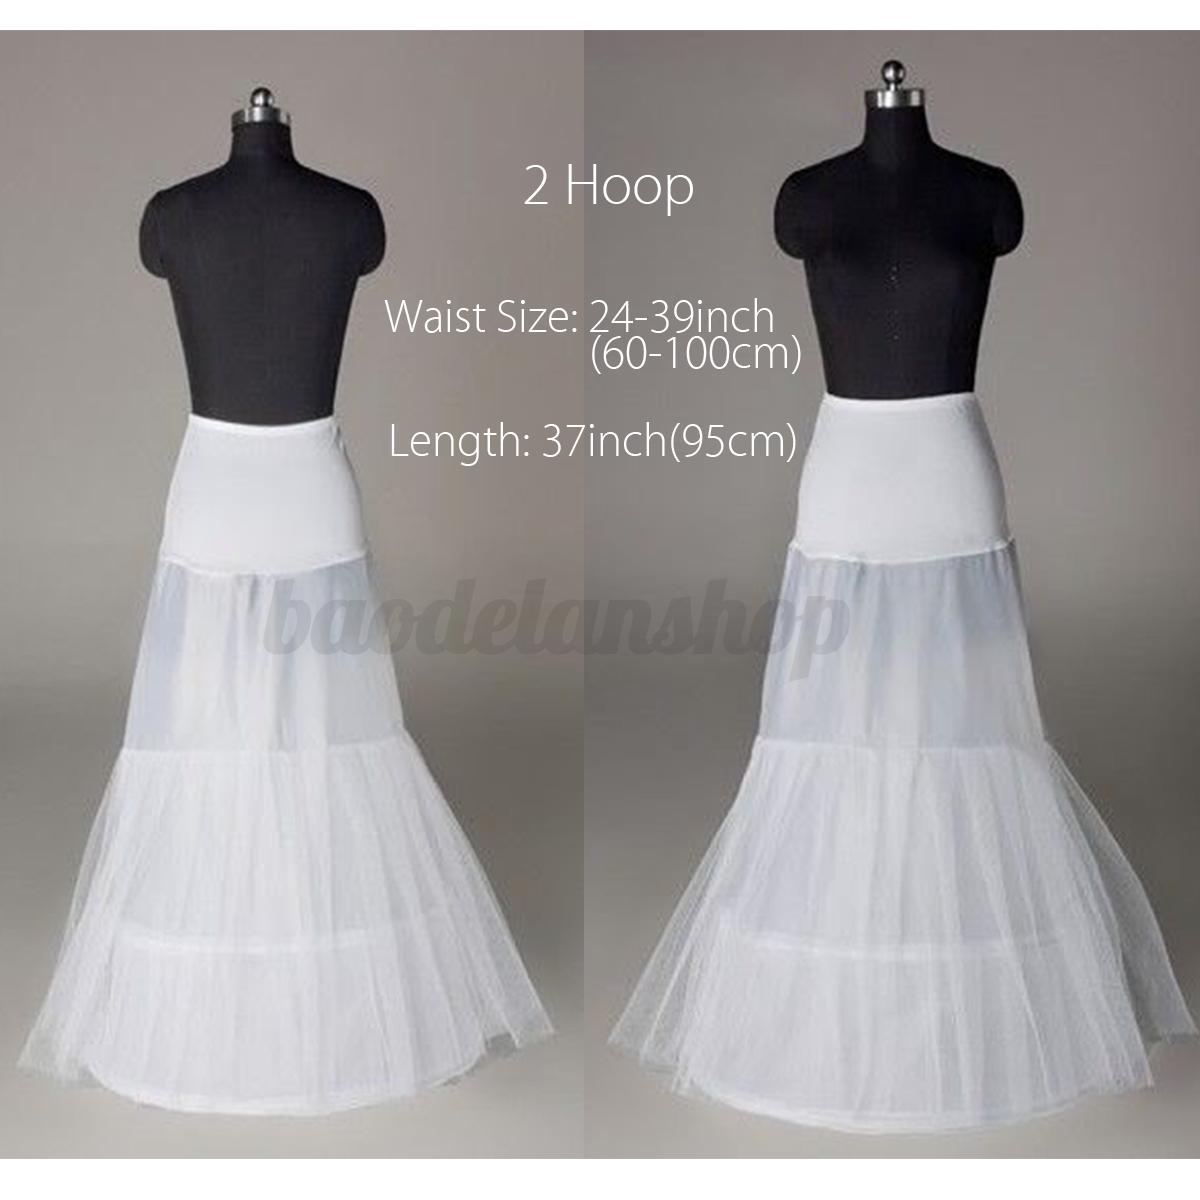 5-Style-Blanc-Jupon-Crinoline-Mariage-Robe-De-Mariee-Soiree-Petticoat-Femme-Mode